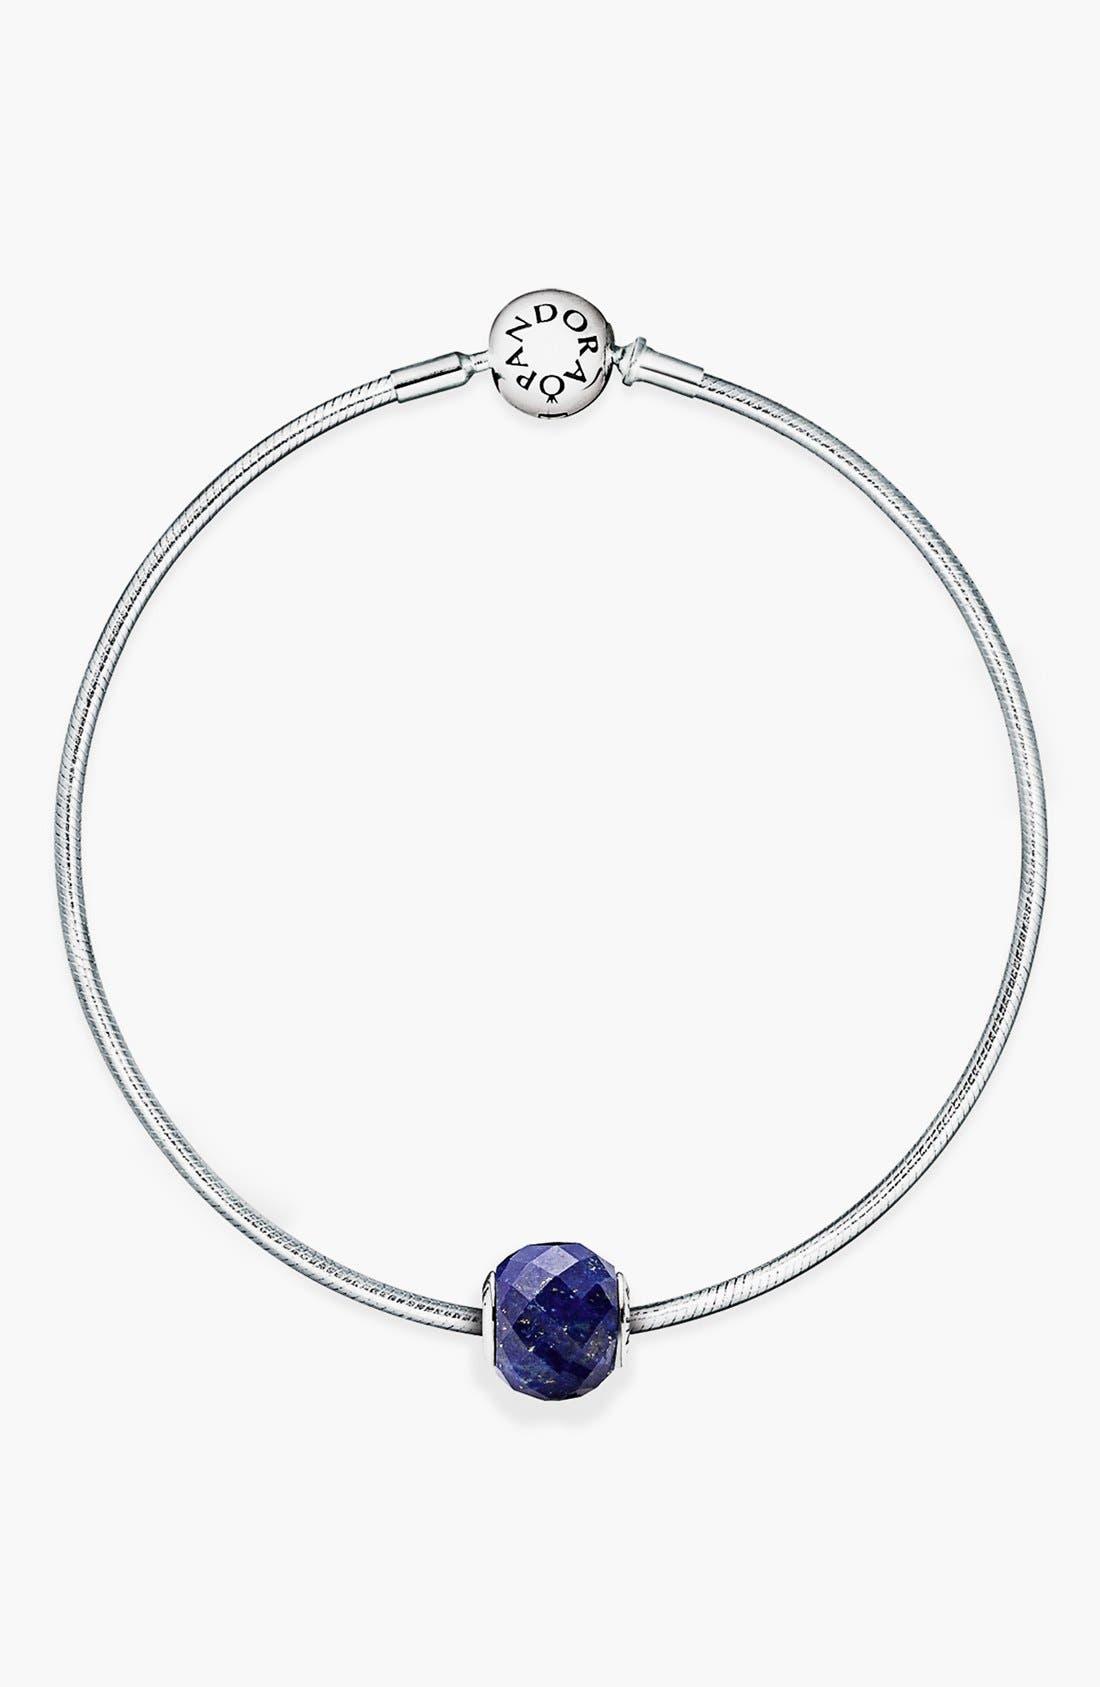 Alternate Image 1 Selected - PANDORA 'Essence - Peace' Charm Bracelet Set